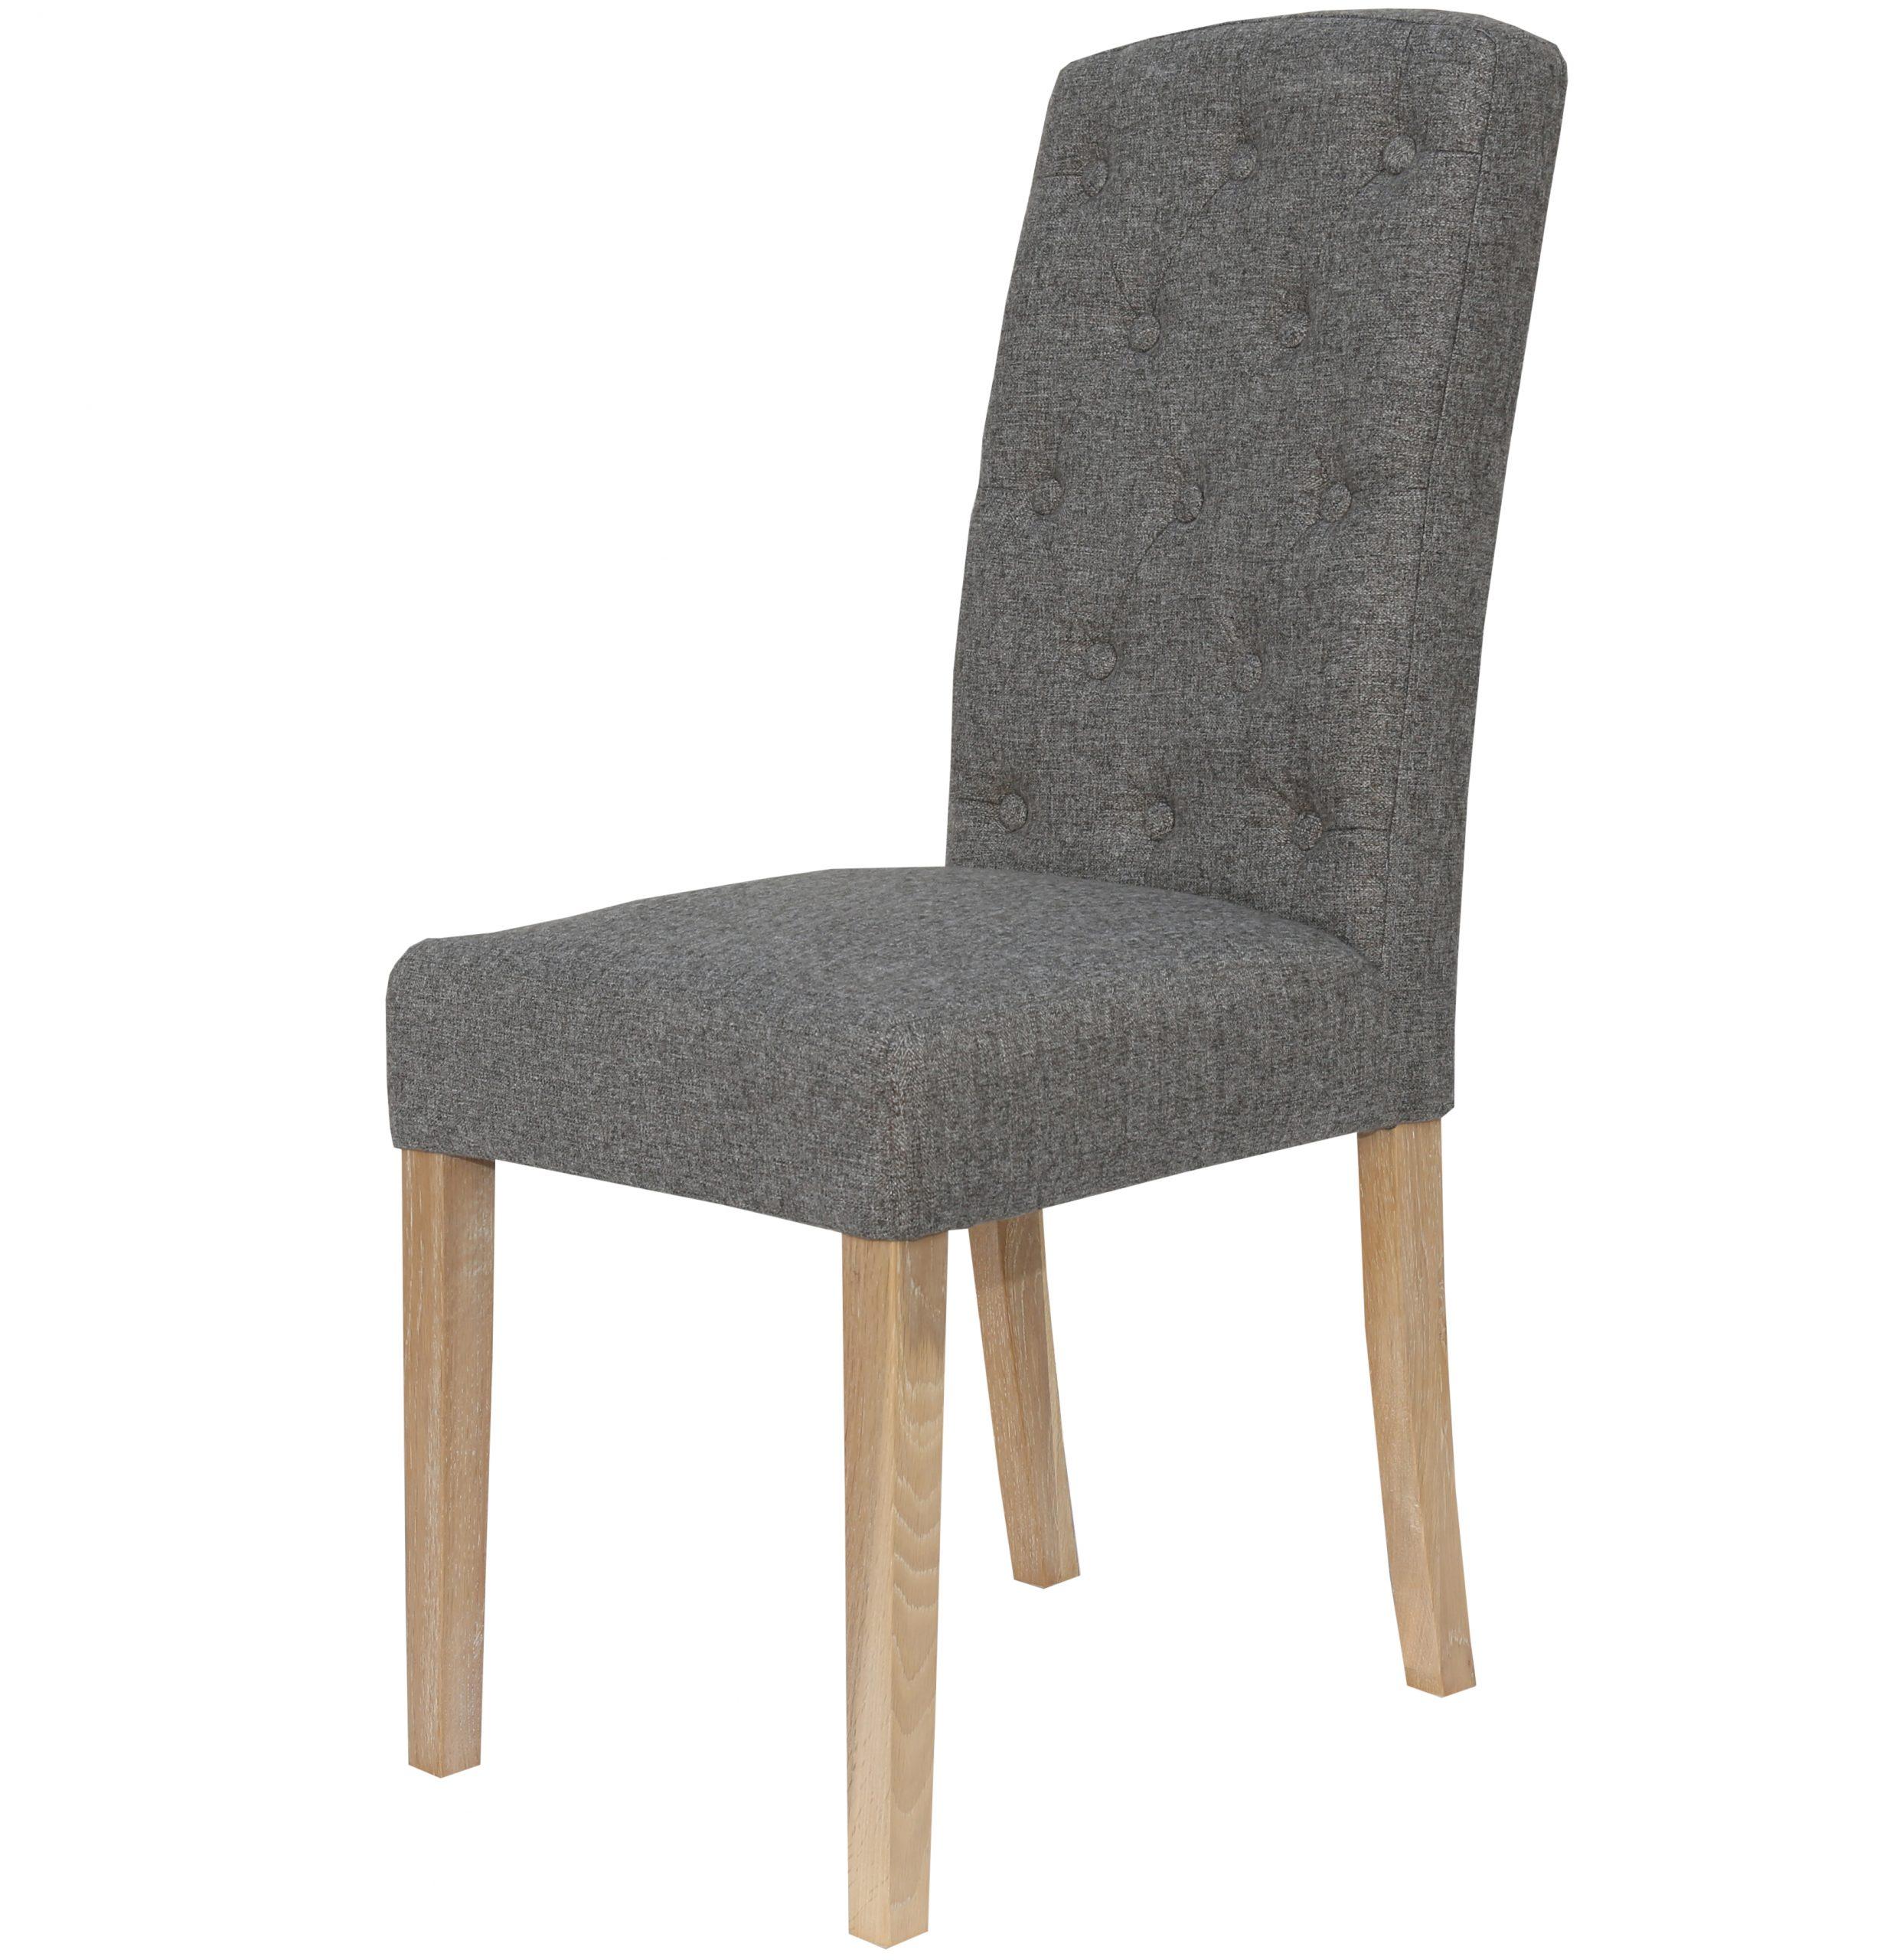 Windsor Dark Grey linen fabric dining chair